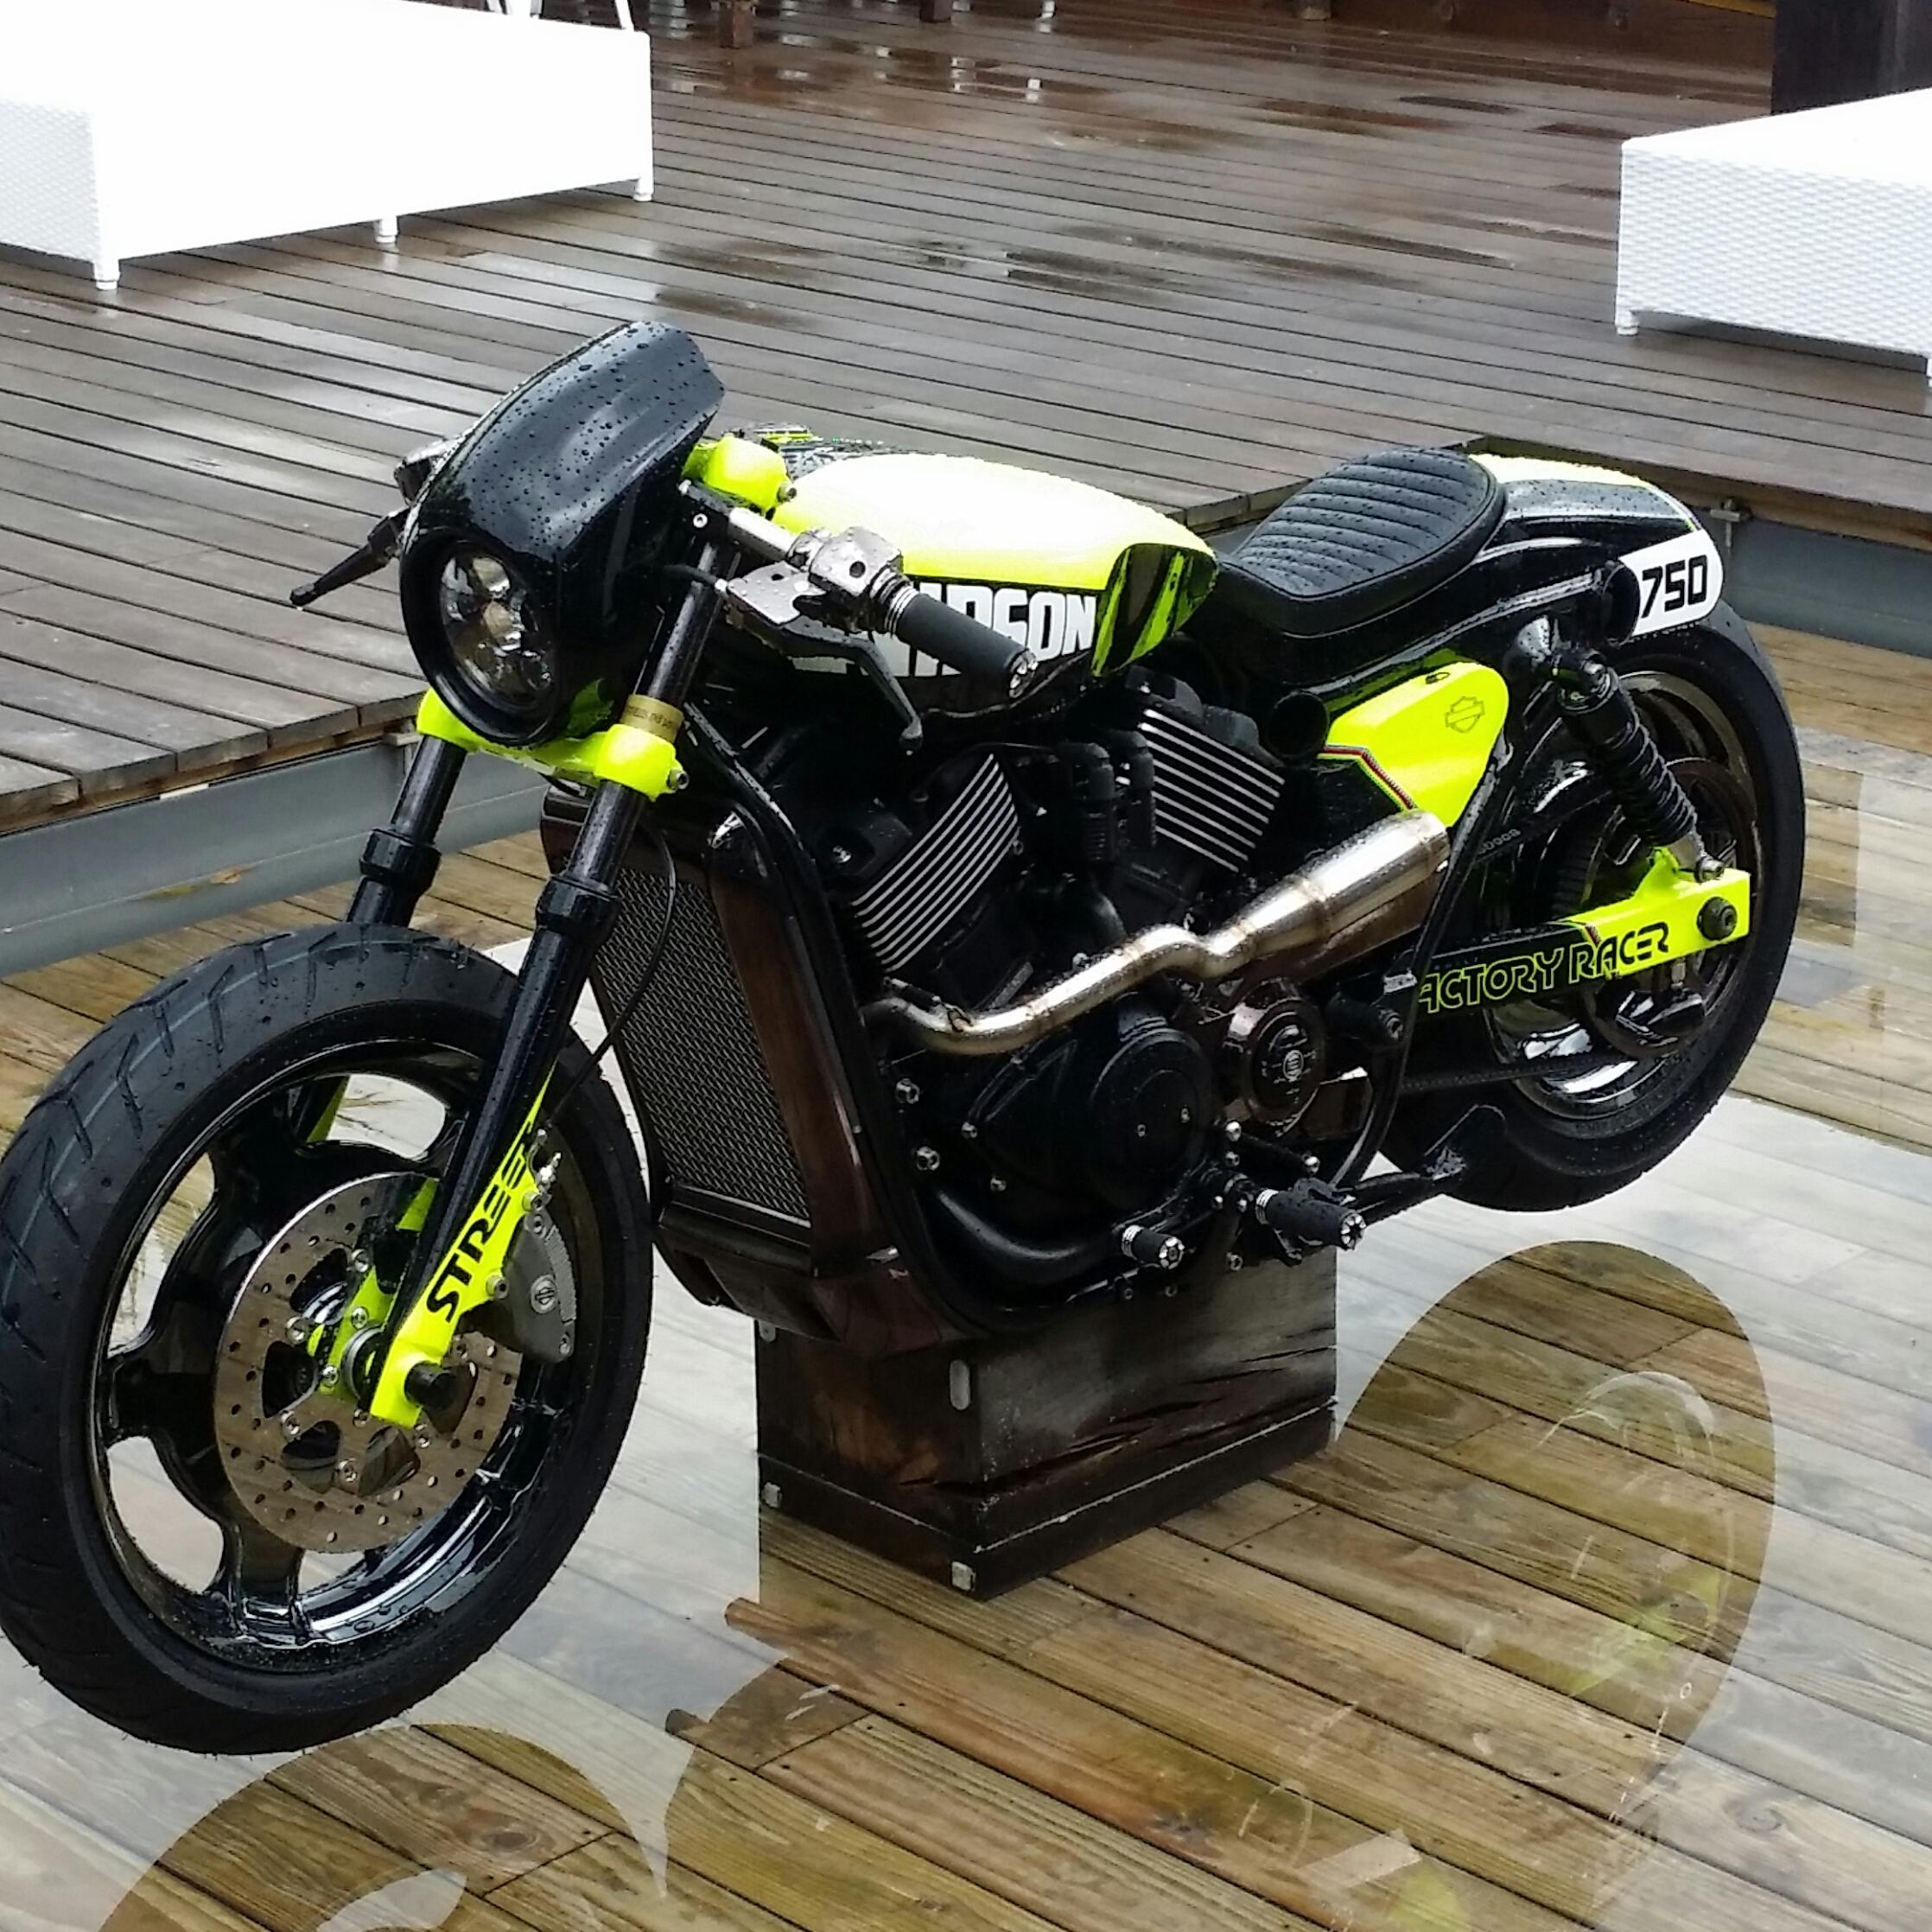 Harley-Davidson Neon Street